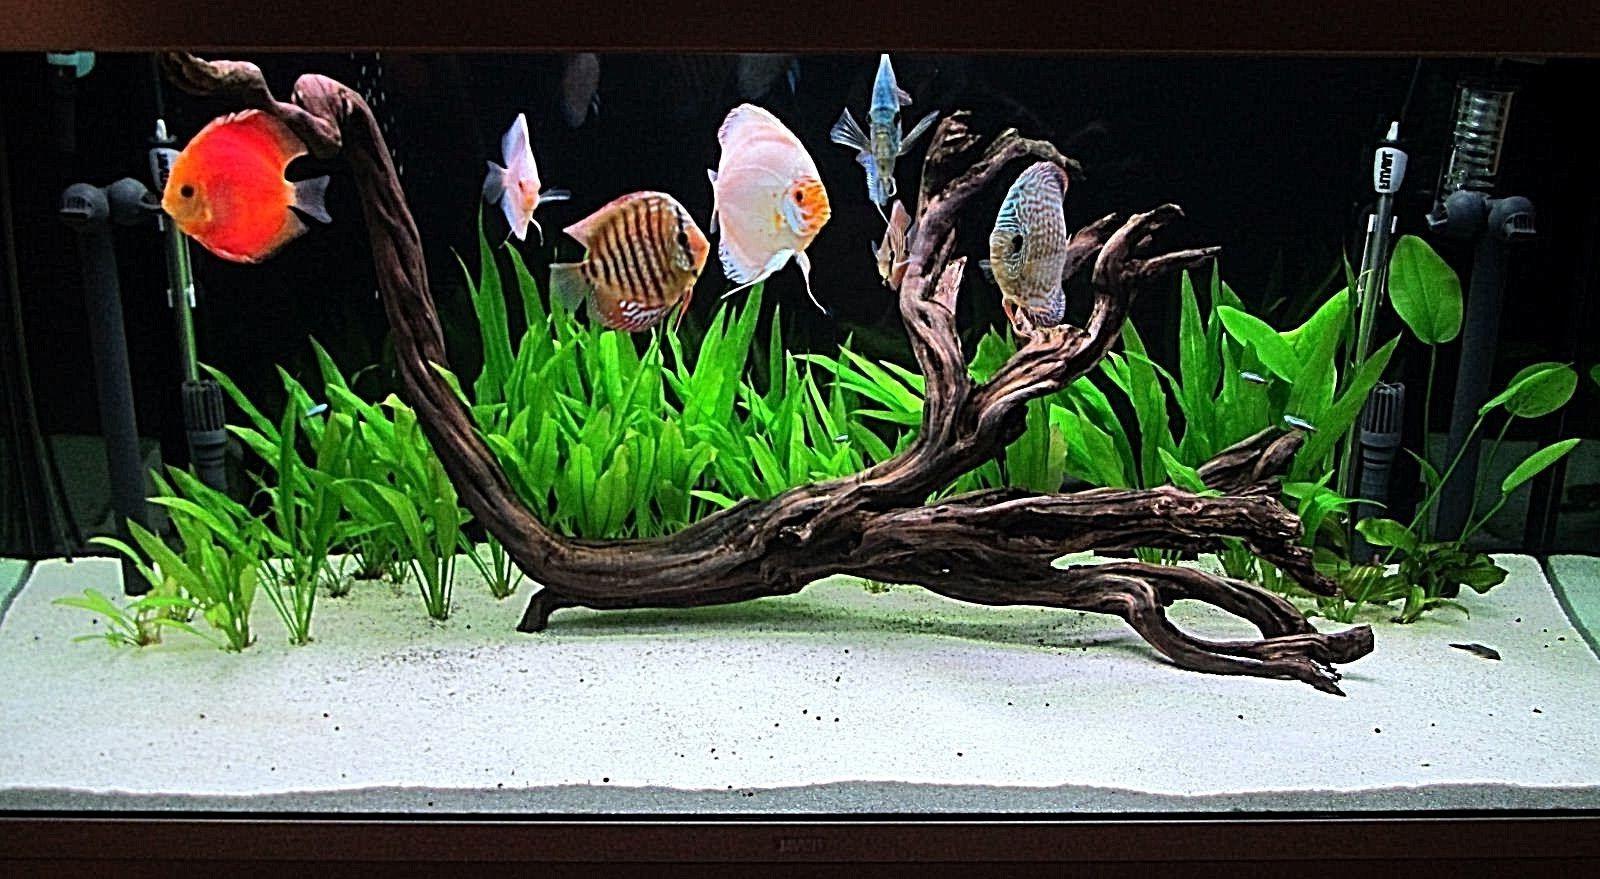 WHITE FISH SAND DISCUS CICHLID'S PLECOSTOMUS SEVERUM'S 42 LB'S